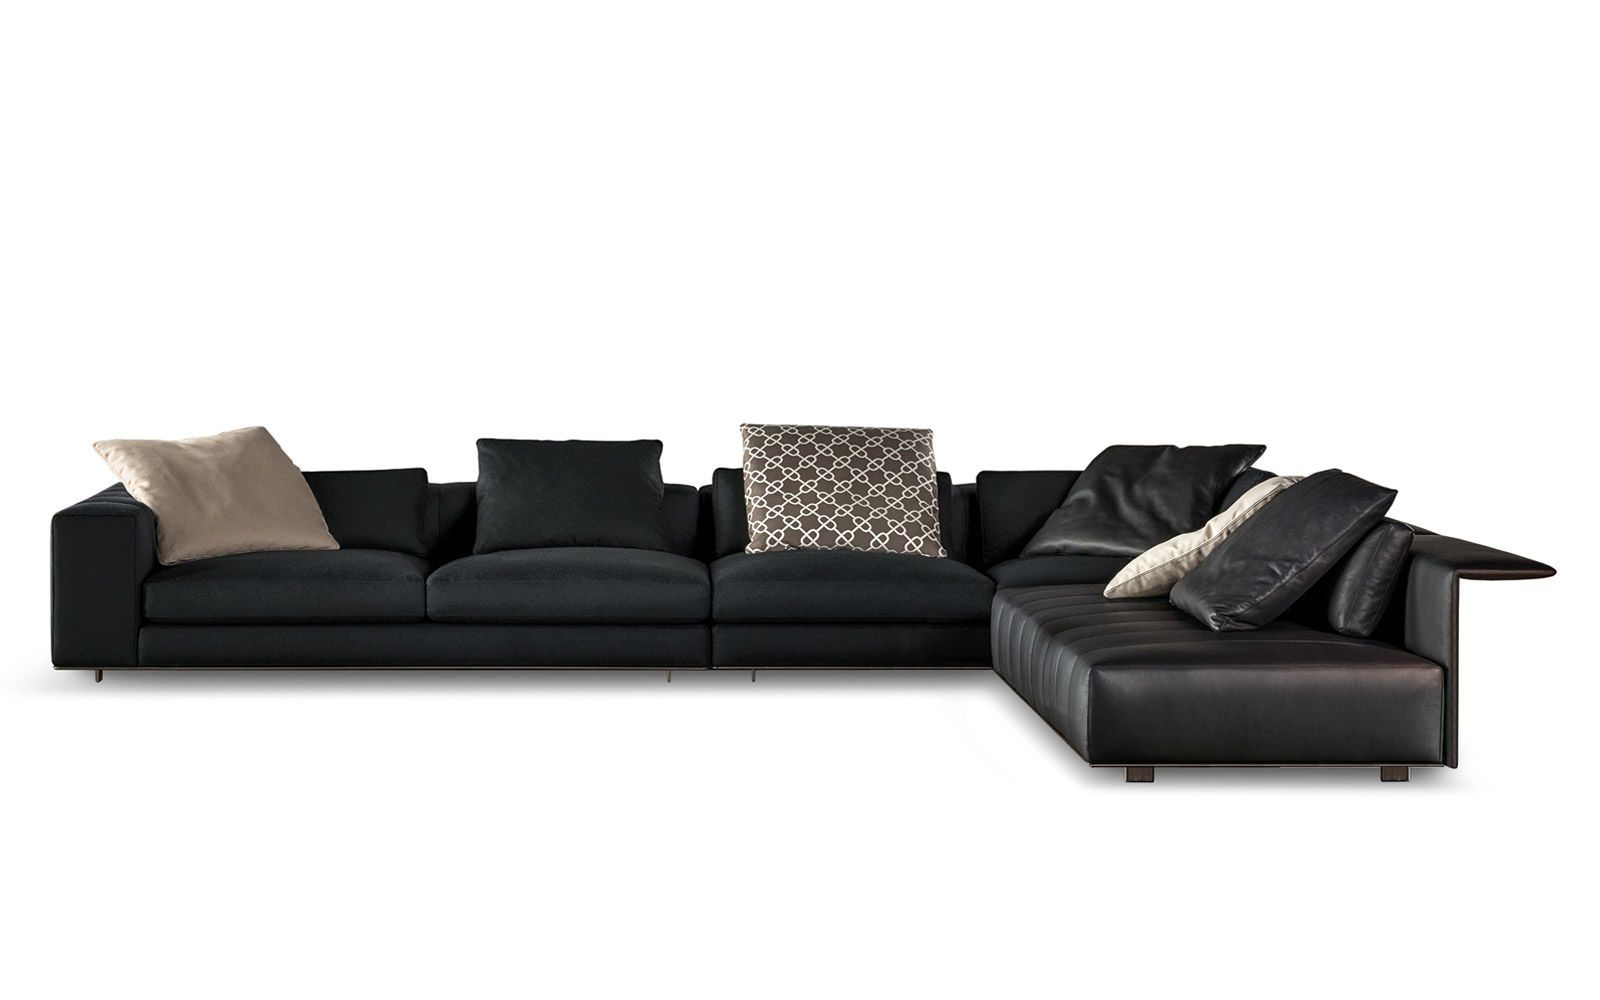 Freeman Seating System Sofas En Sofa Sofa Modular Sofa